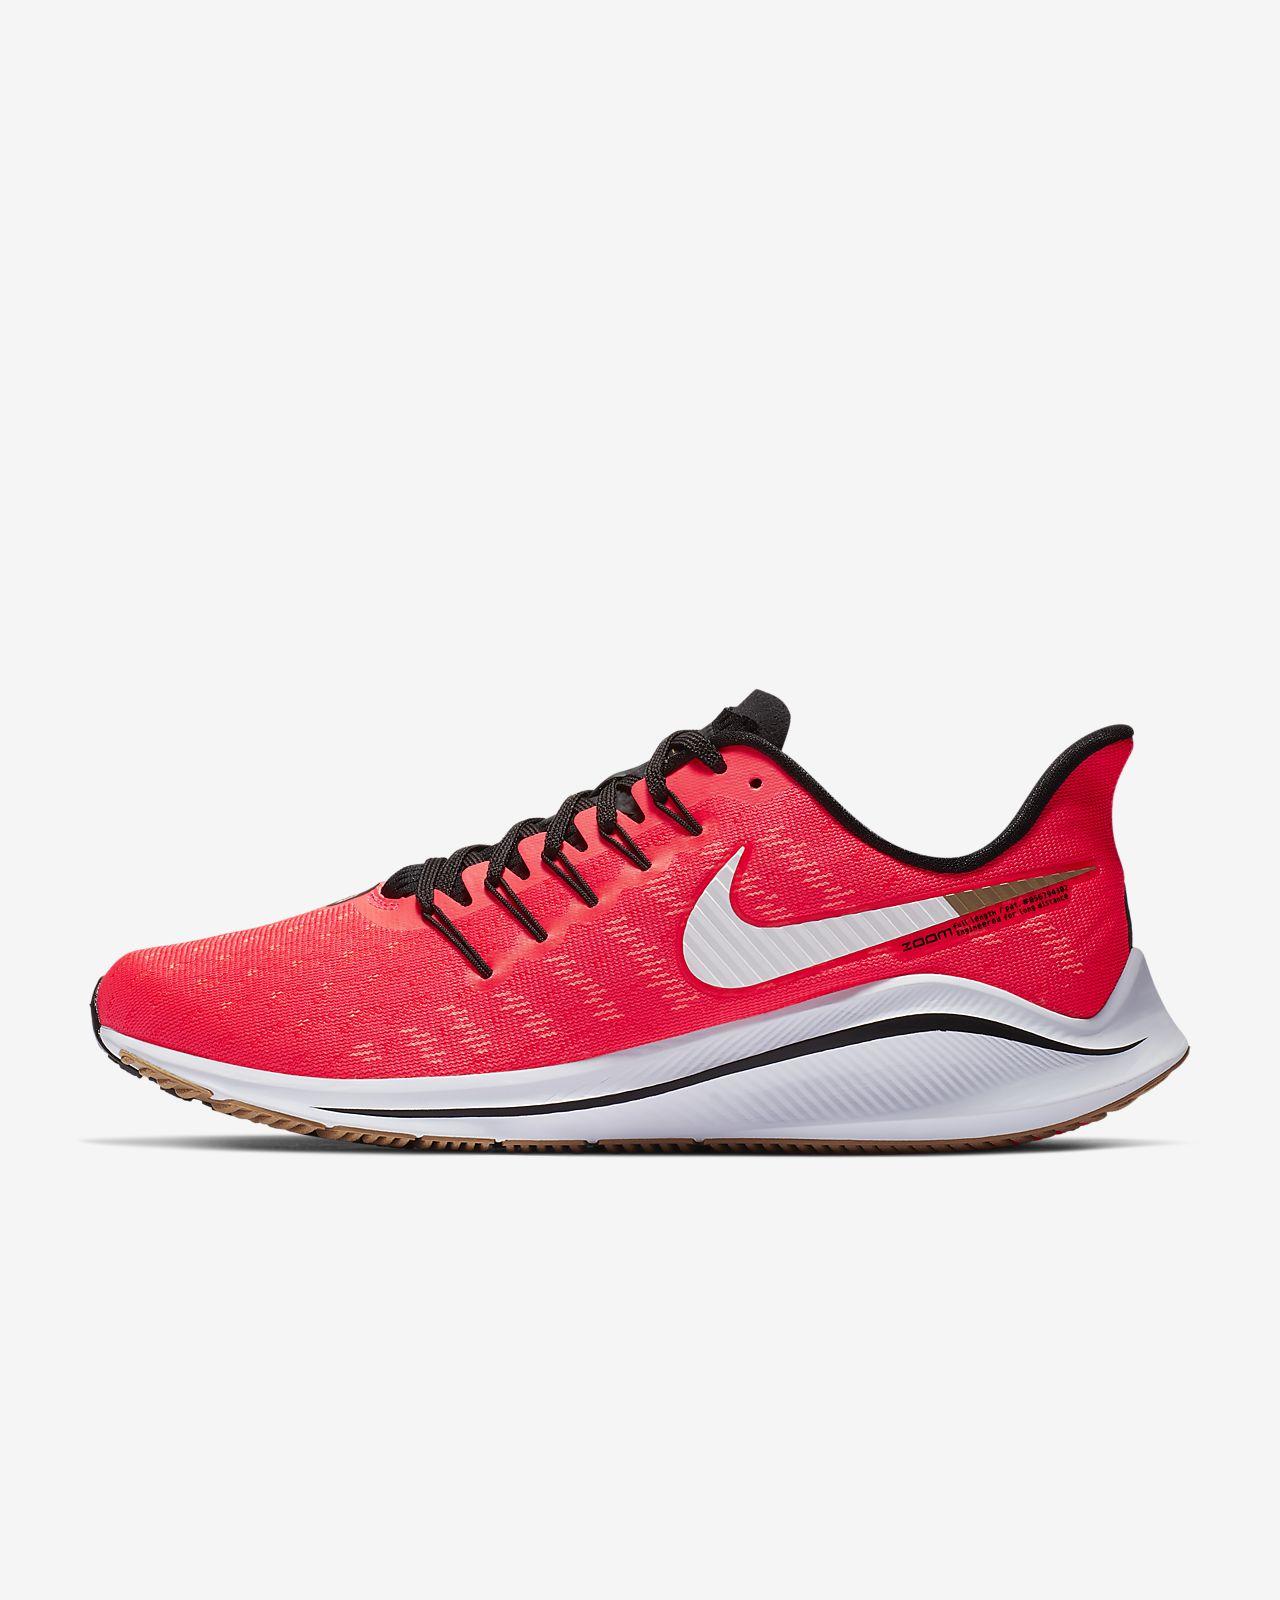 d20f5ca9892 Nike Air Zoom Vomero 14 Men s Running Shoe. Nike.com NO